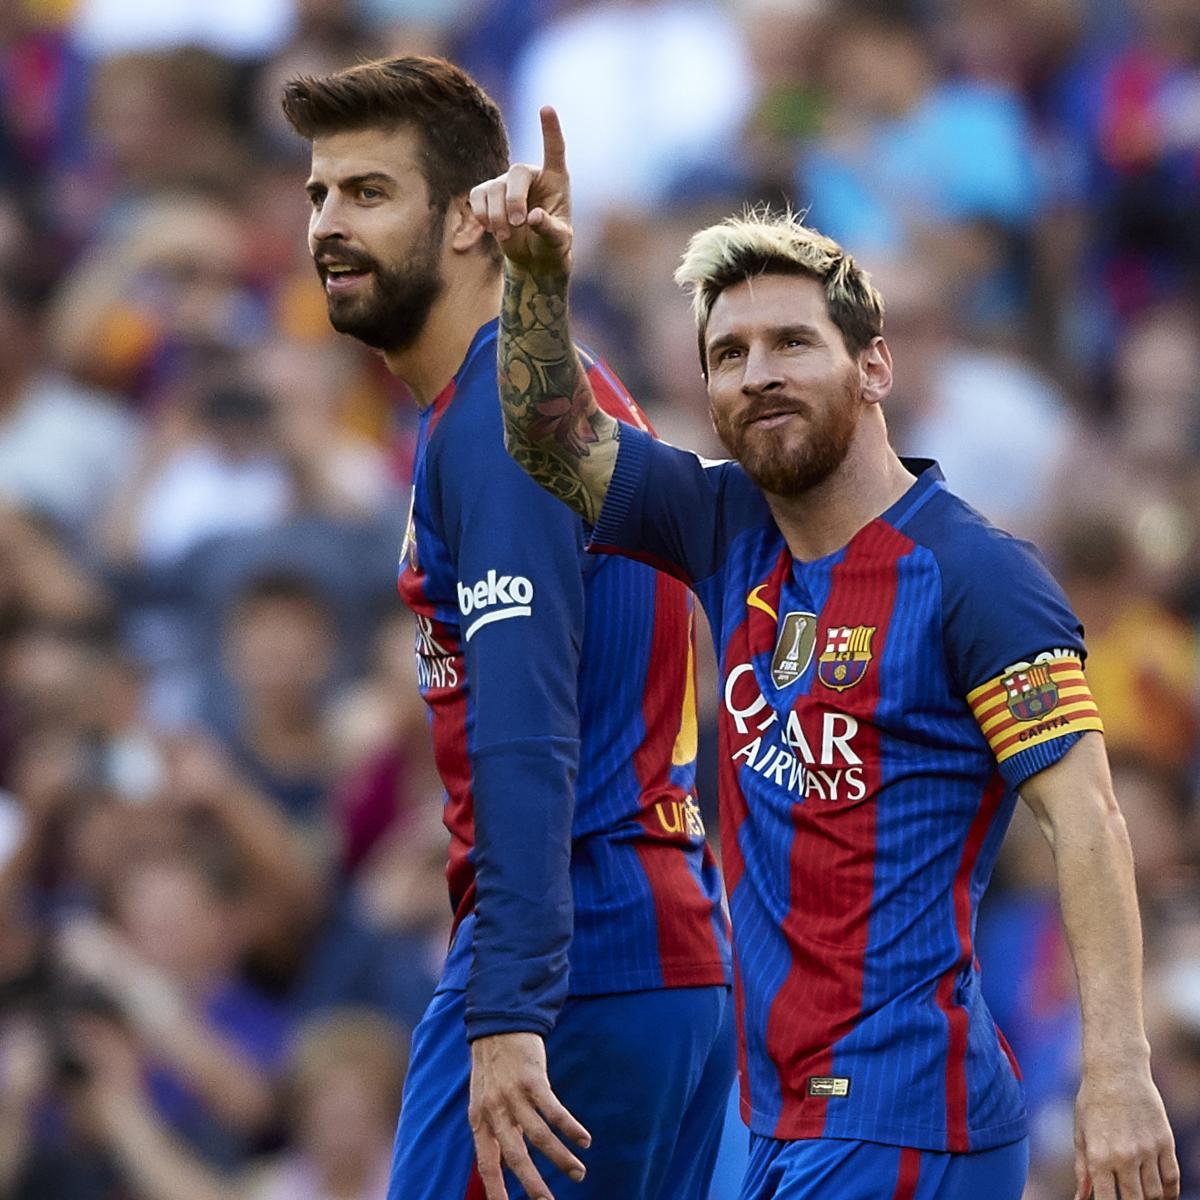 Barcelona Vs. Deportivo: Score And Reaction From 2016 La